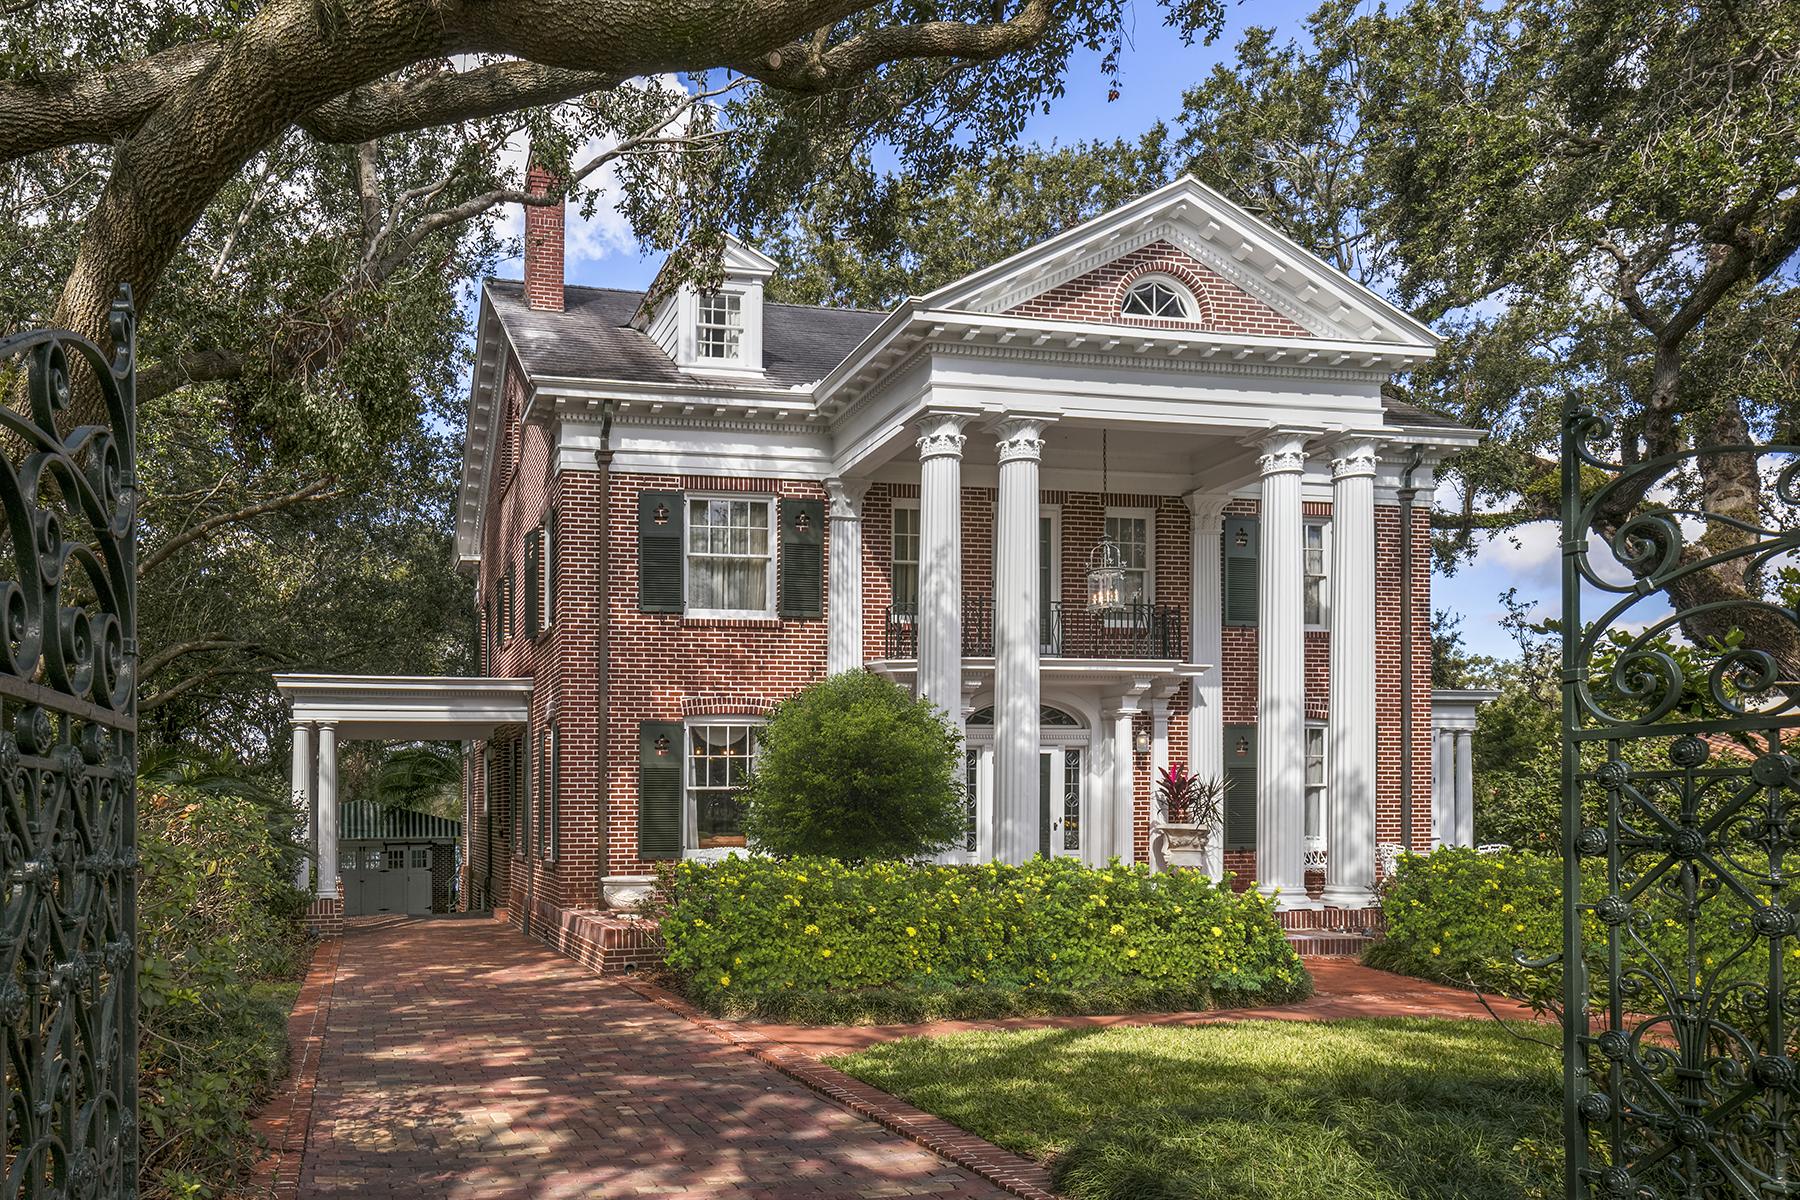 Additional photo for property listing at ORLANDO 239 E Copeland Dr,  Orlando, Florida 32806 United States